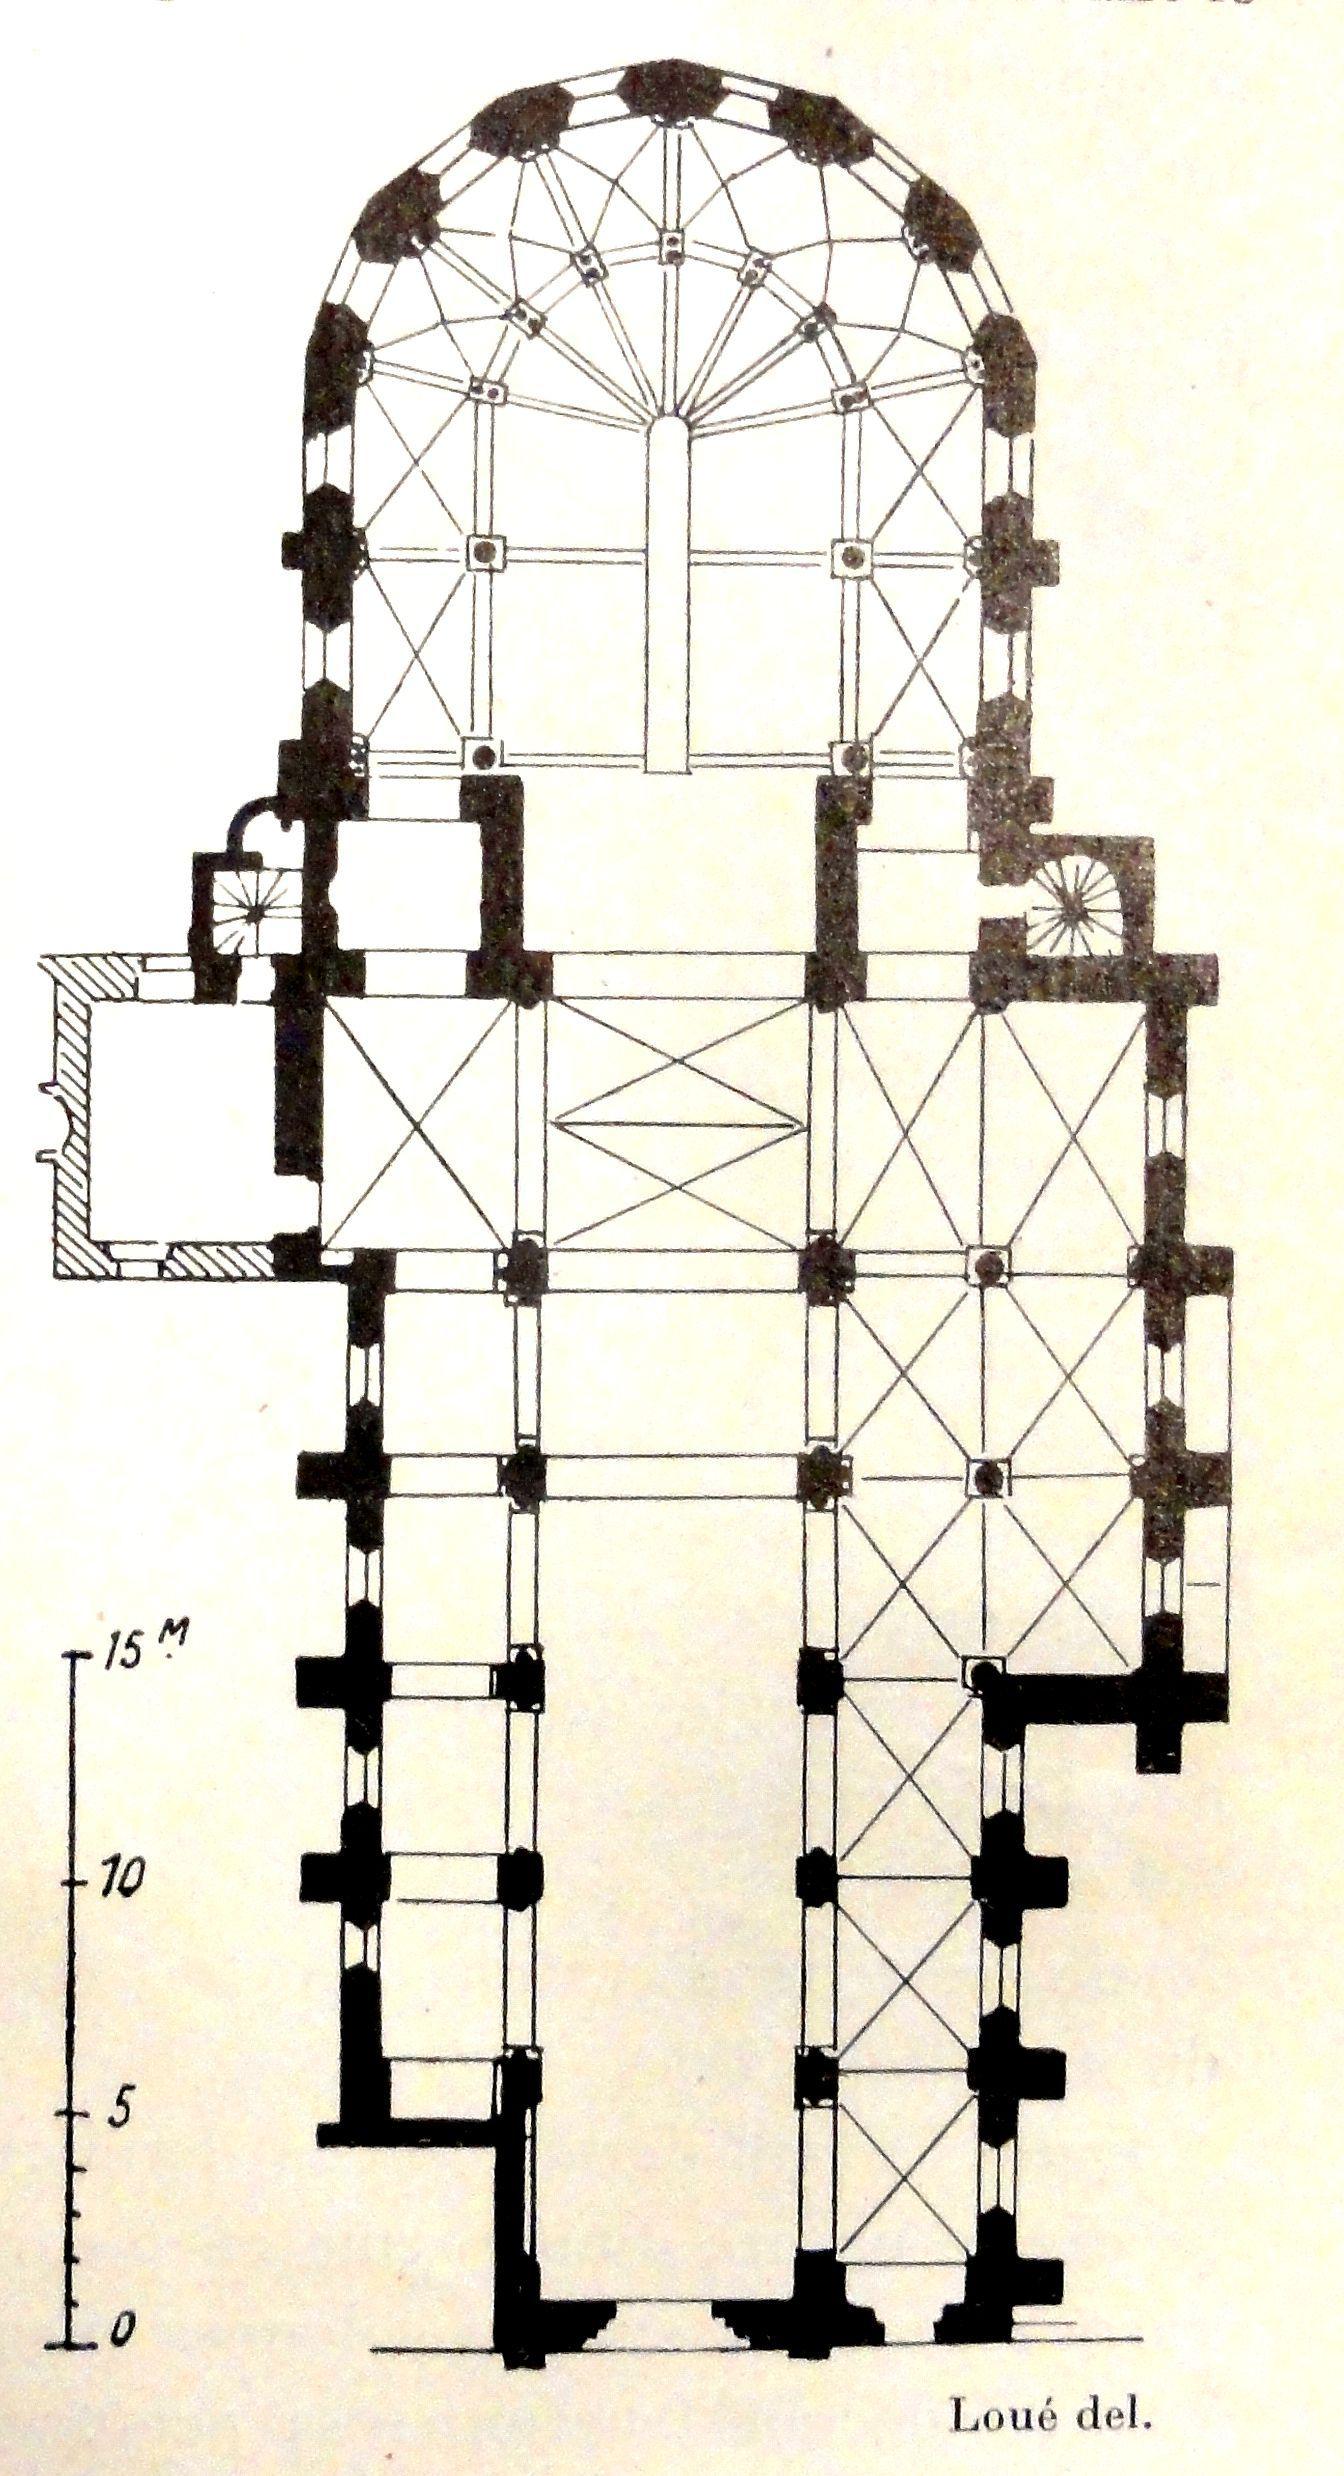 file deuil la barre 95 glise notre dame wikimedia commons. Black Bedroom Furniture Sets. Home Design Ideas